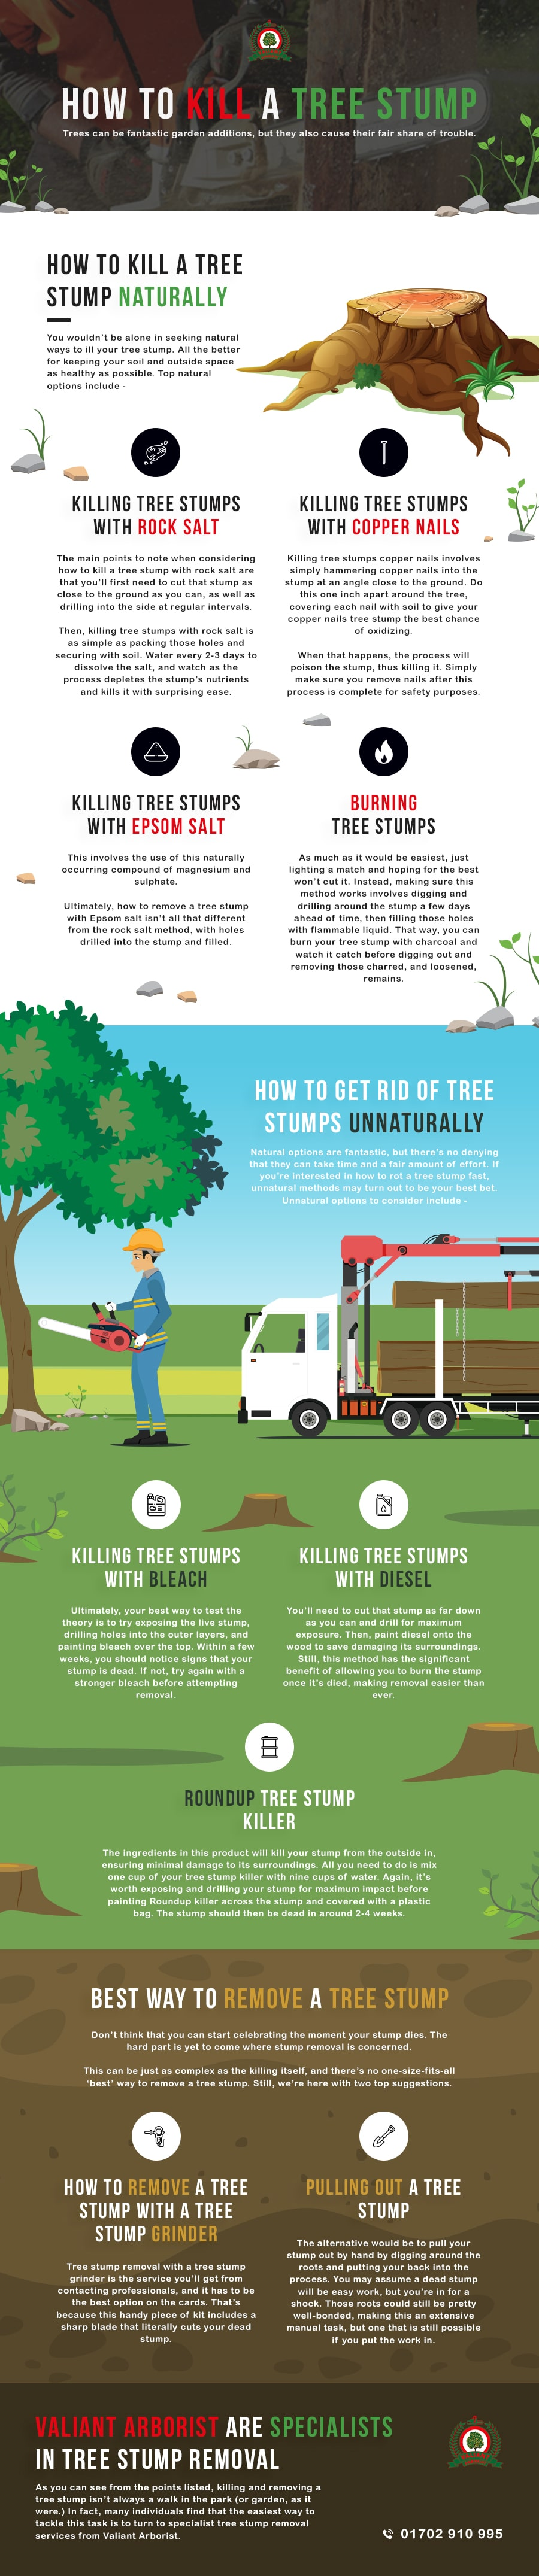 Killing Tree Stumps Copper Nails : killing, stumps, copper, nails, Stump, Naturally, Unnaturally, Valiant, Arborist